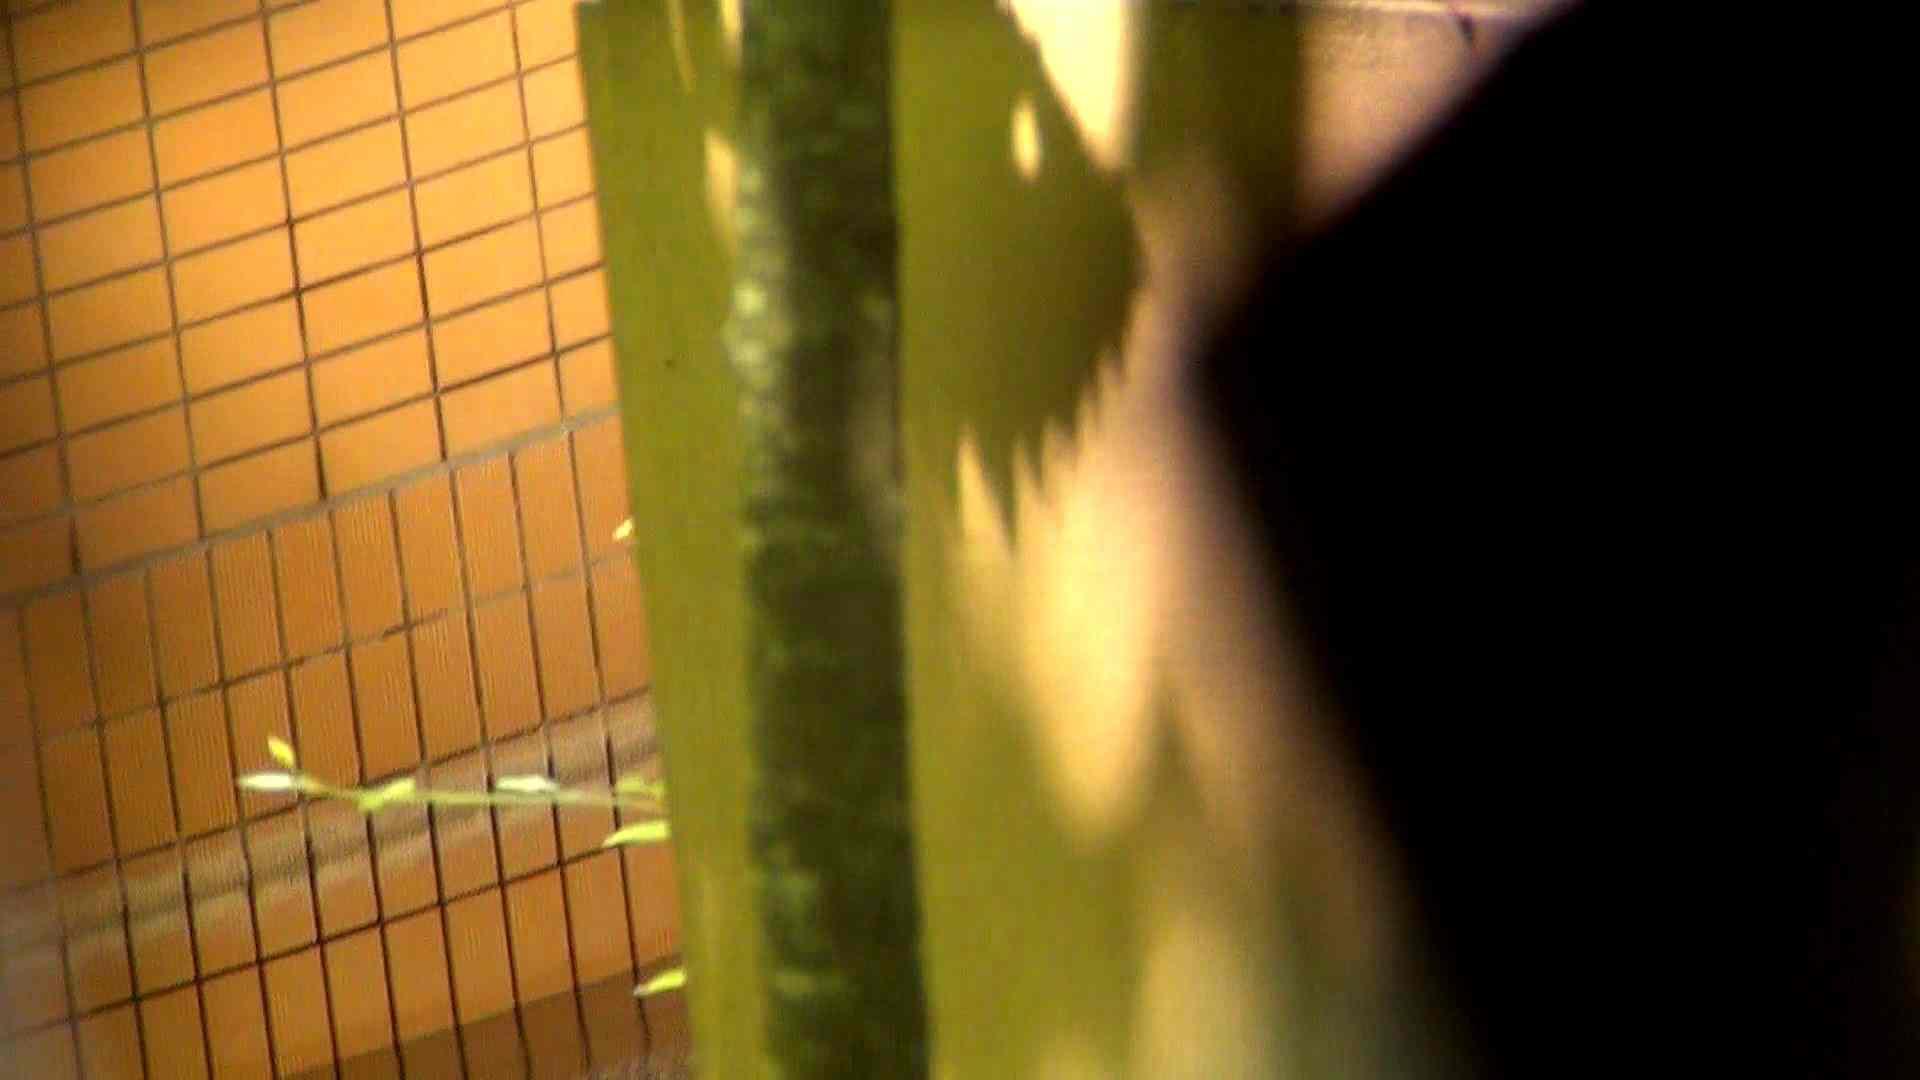 Vol.37 オデブと妊婦とokaasann 巨乳 ワレメ無修正動画無料 94枚 55